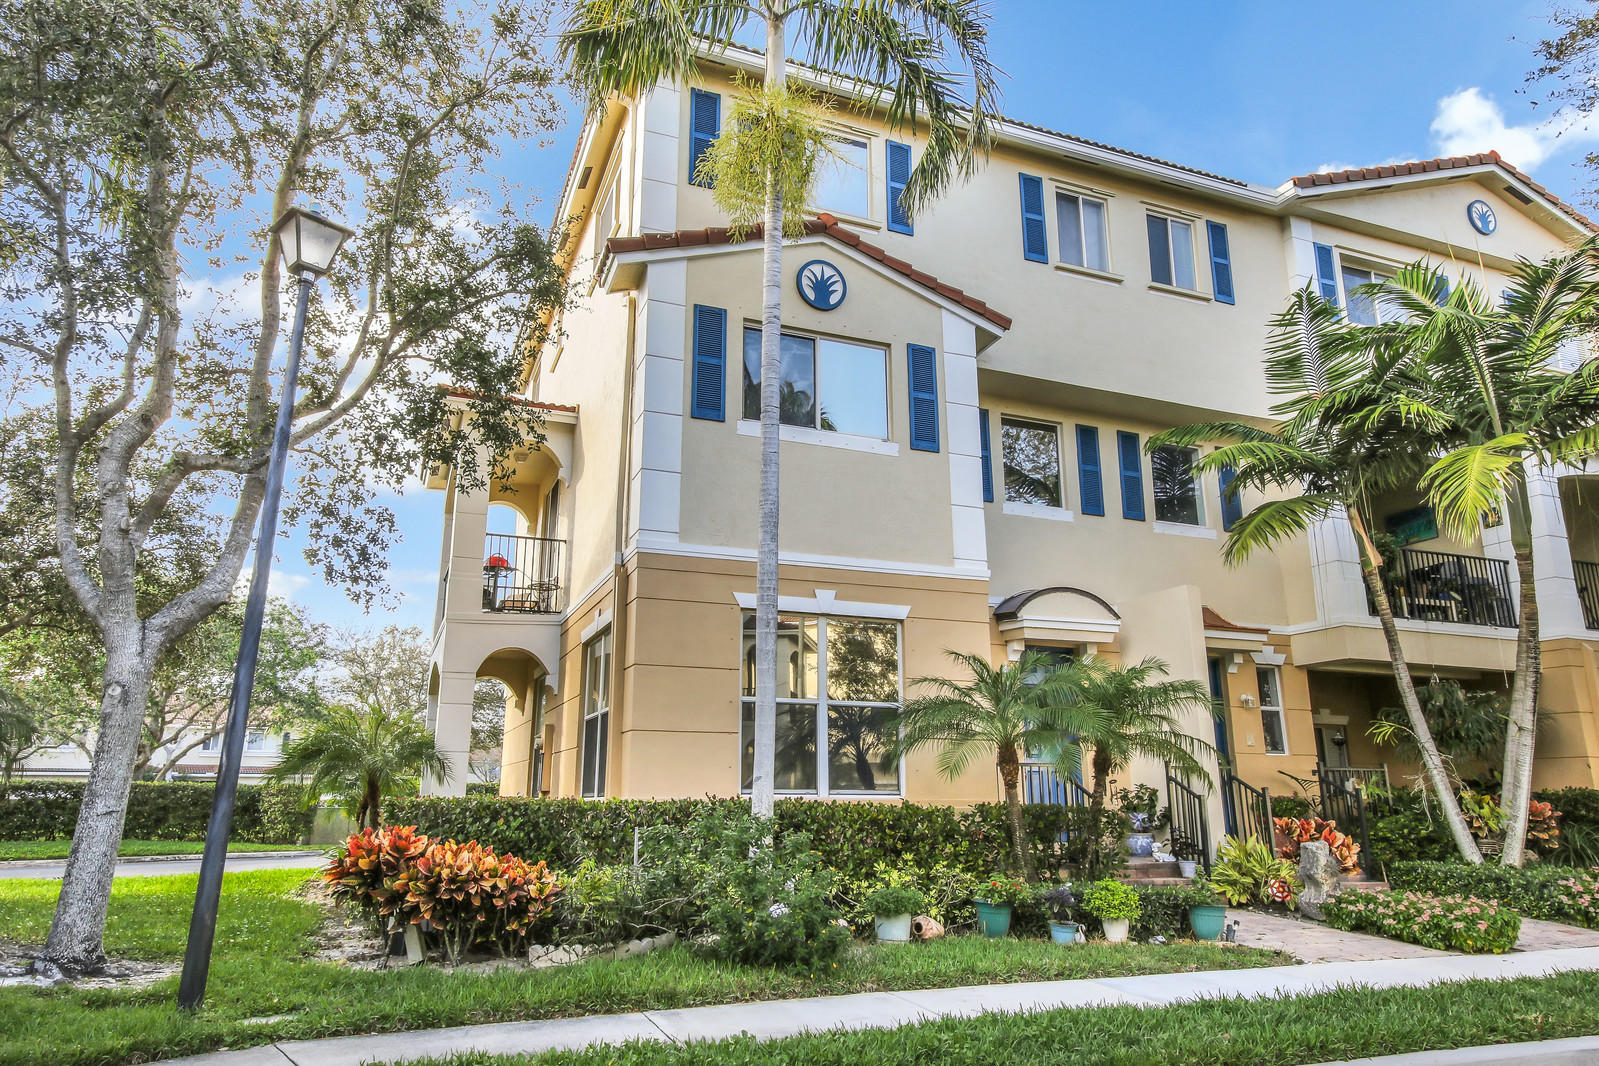 3134 N Oasis Drive, Boynton Beach, FL 33426